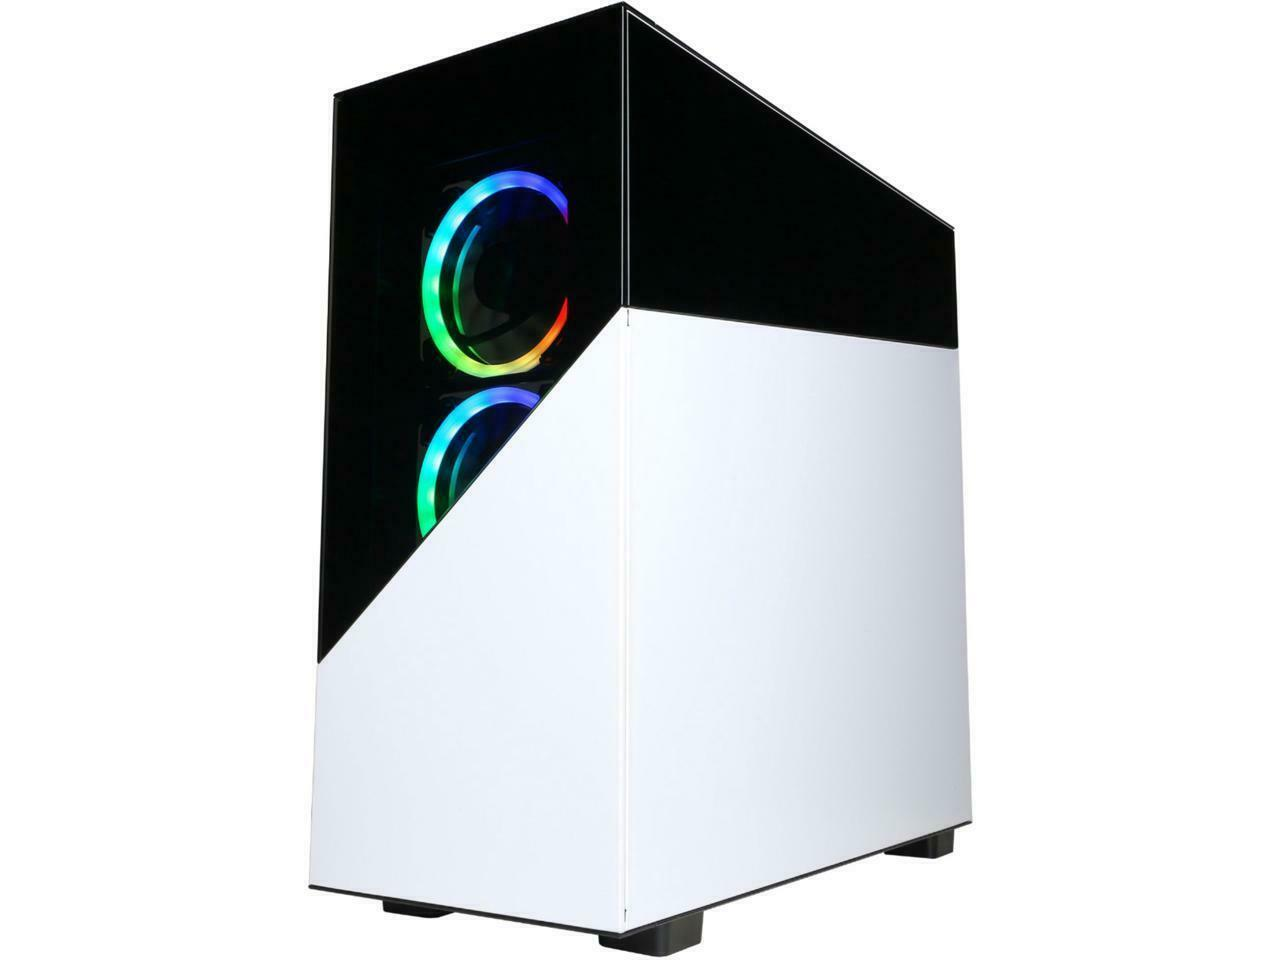 CyberPower Gaming PC-AMD Ryzen 7 3700X-NVIDIA RTX 2070 SUPER - SLC7800BST